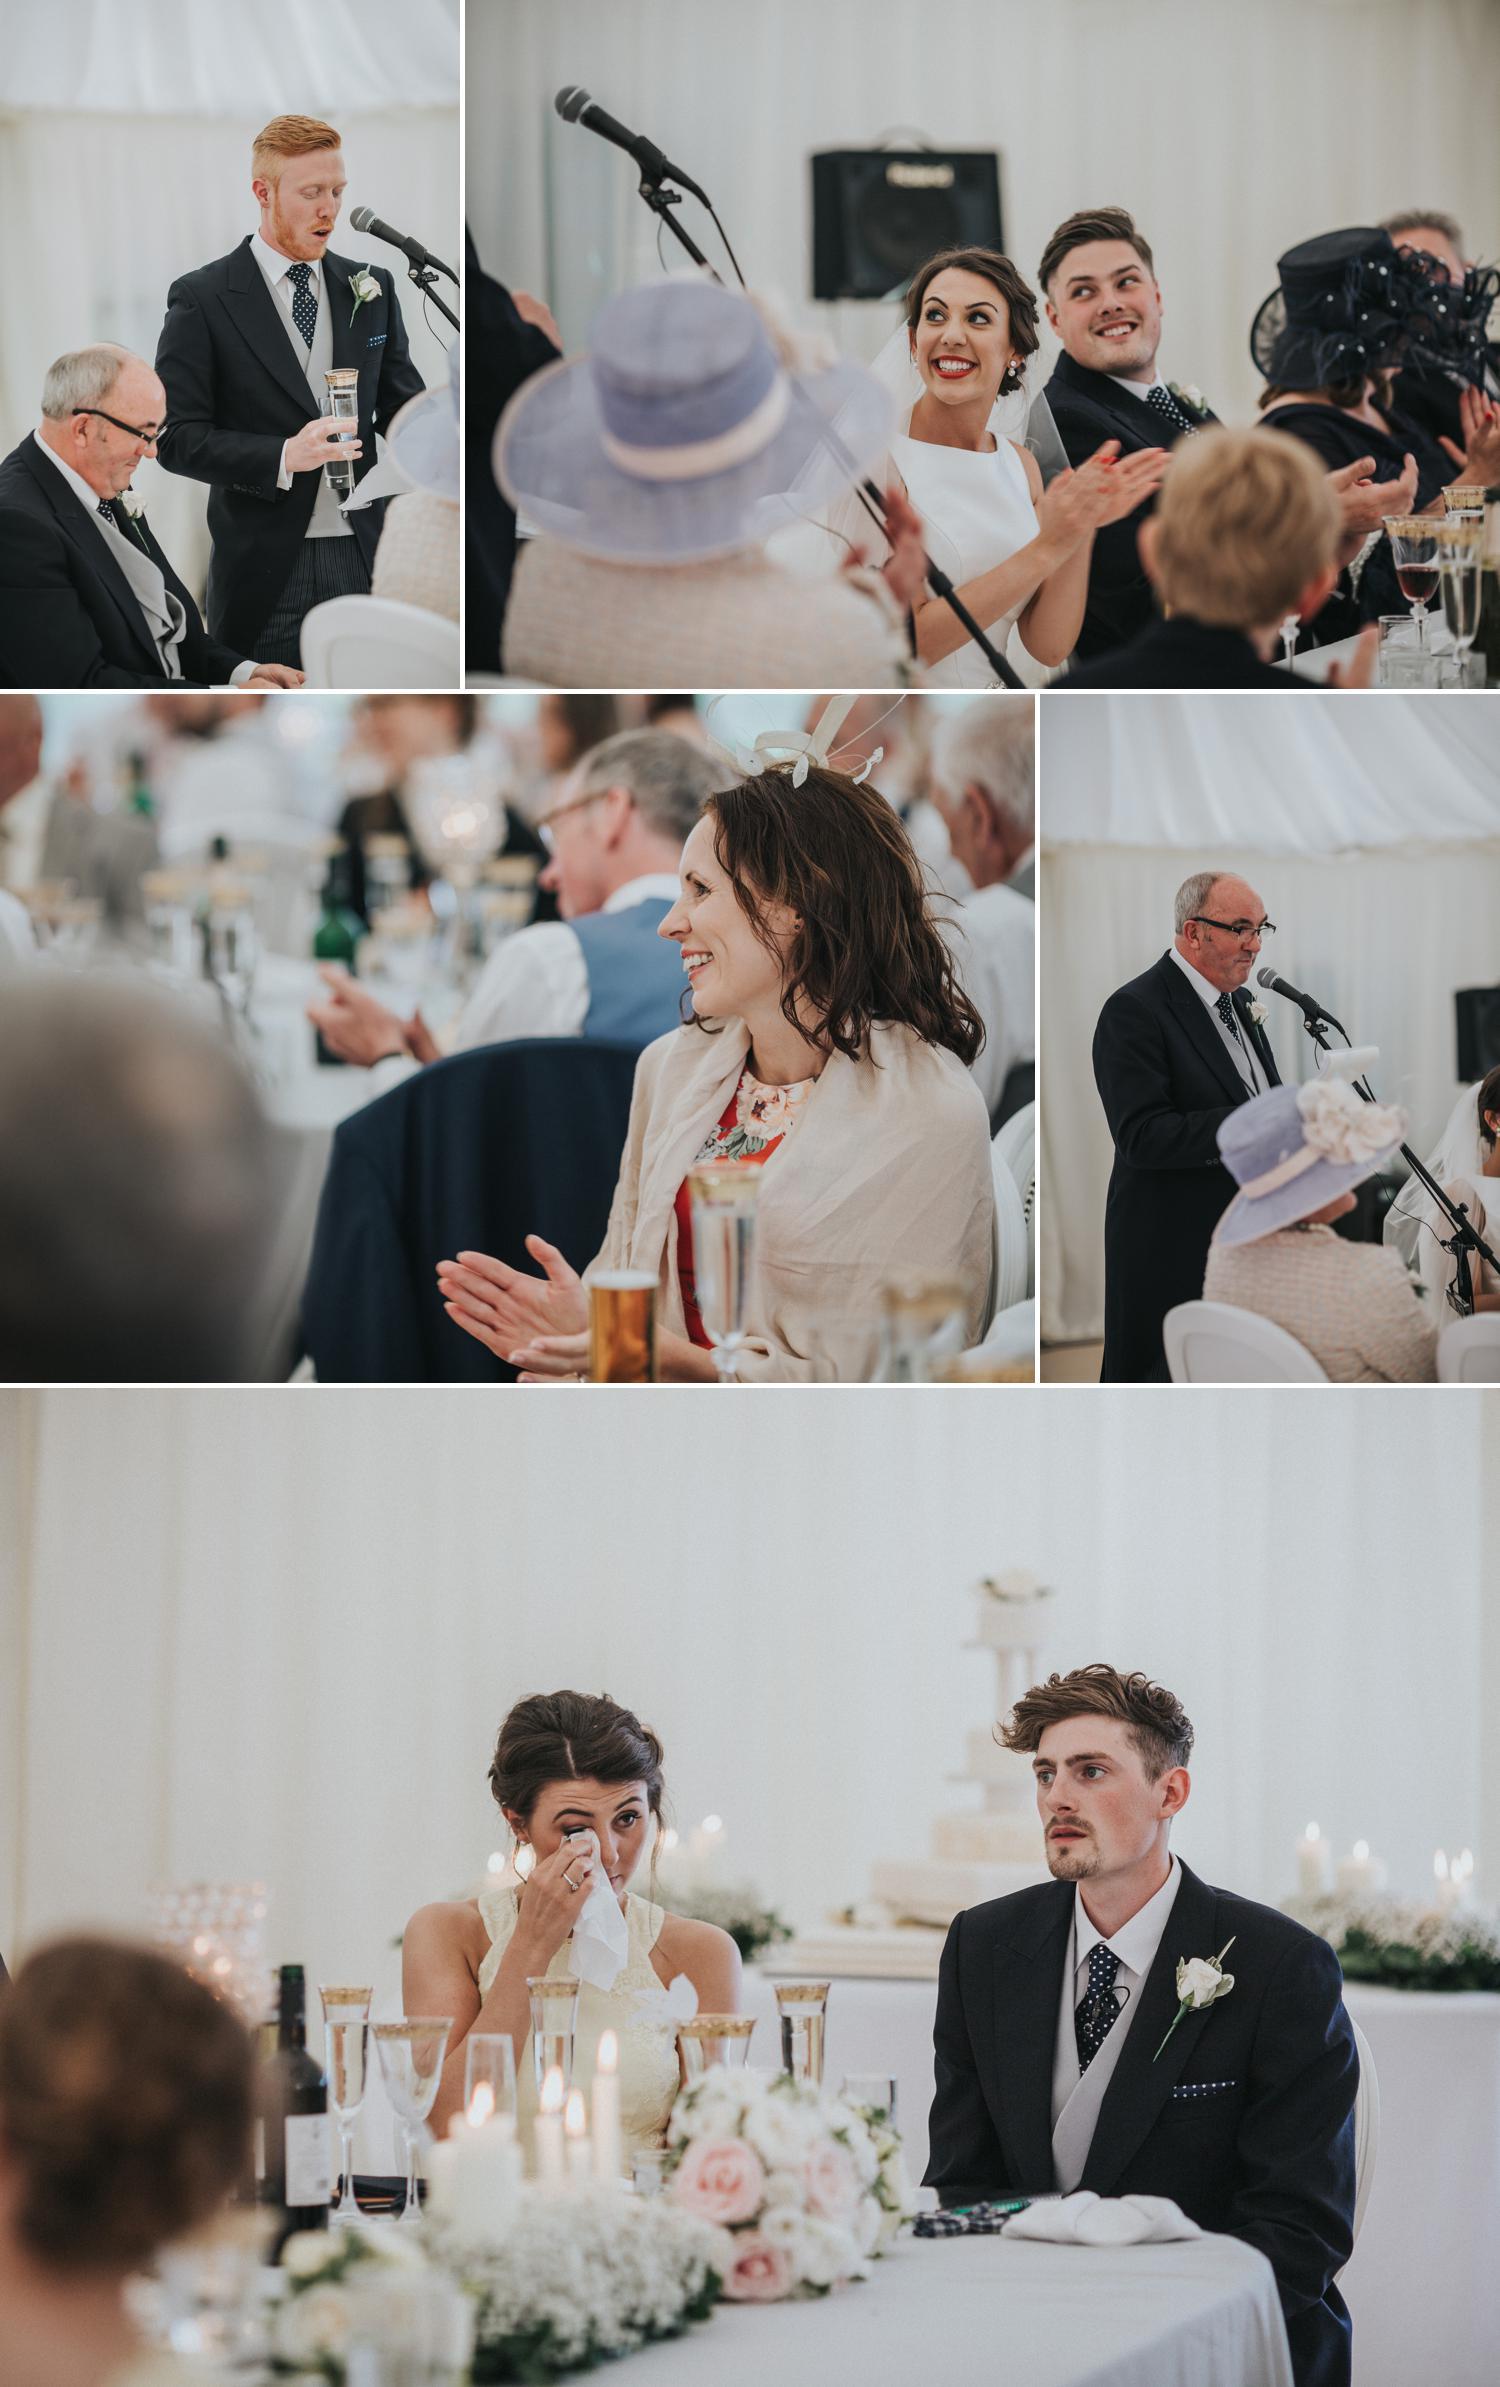 the-citadel-wedding-photography 17.jpg